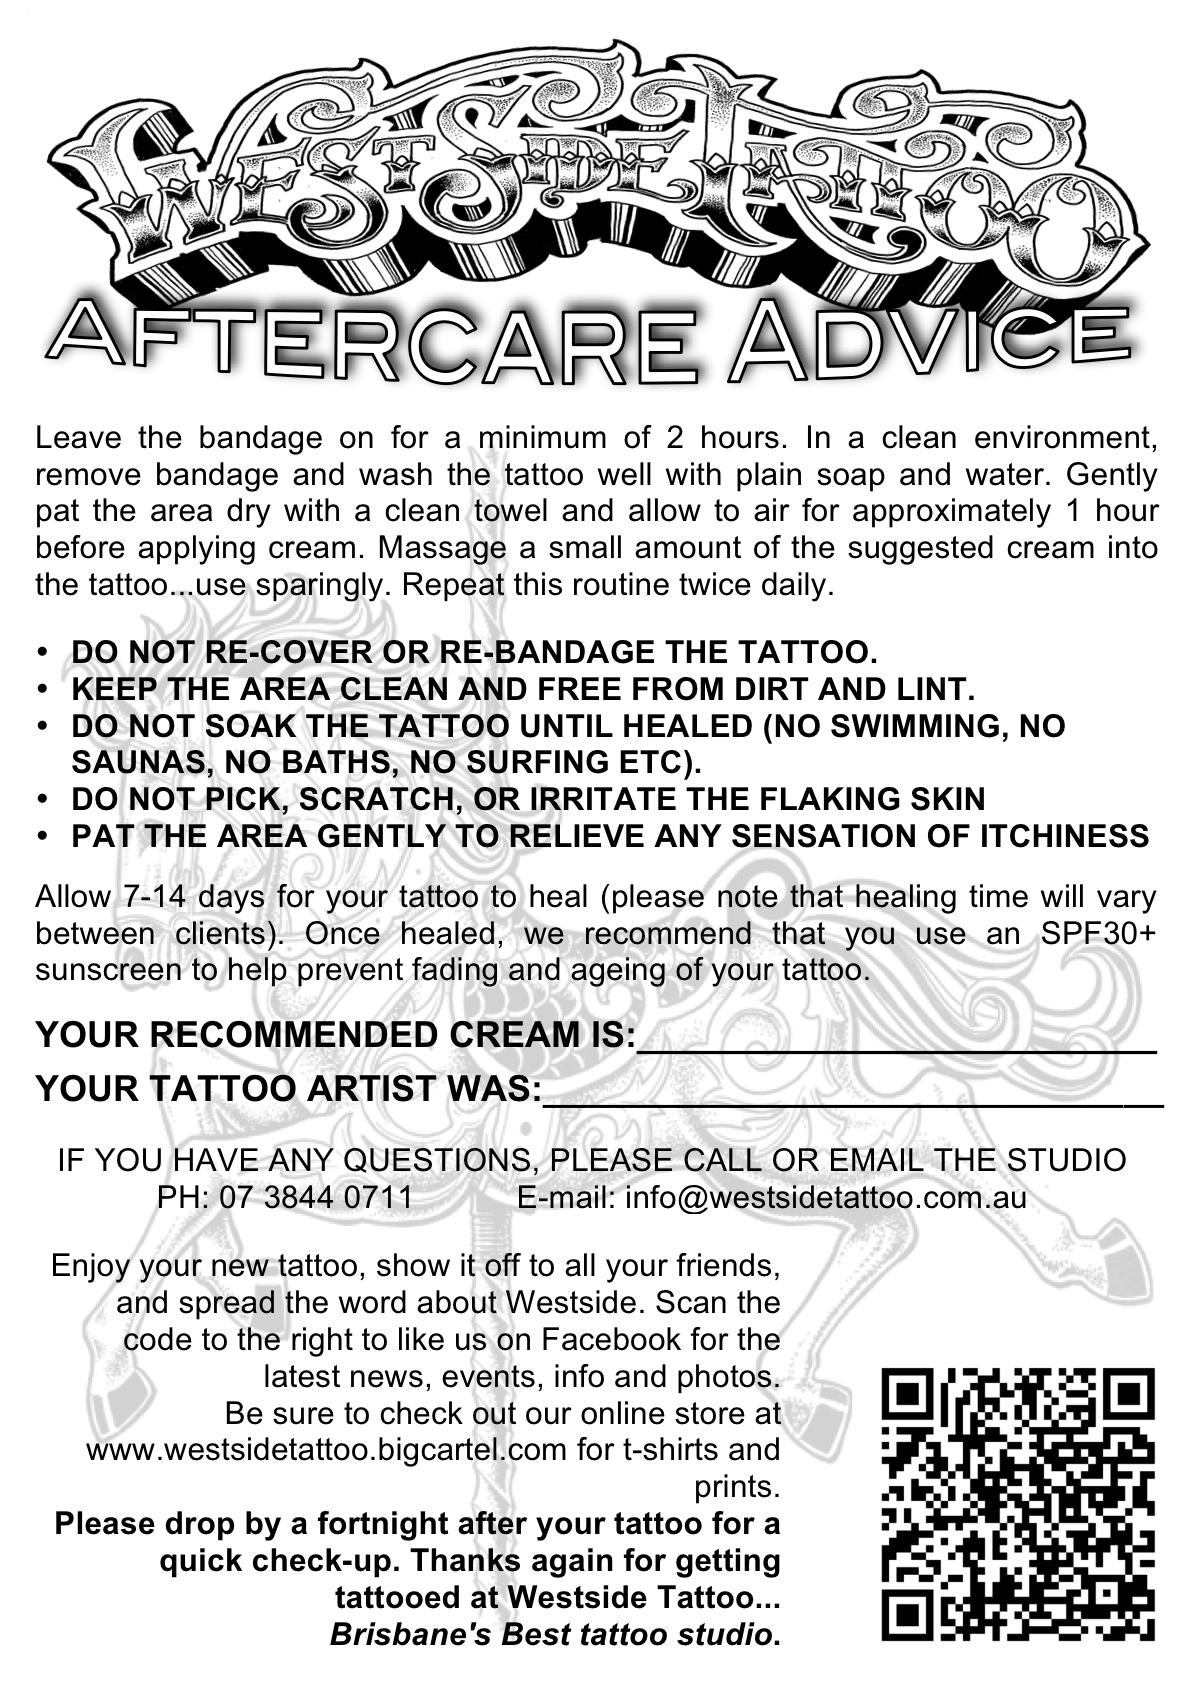 Aftercare advice – Westside Tattoo